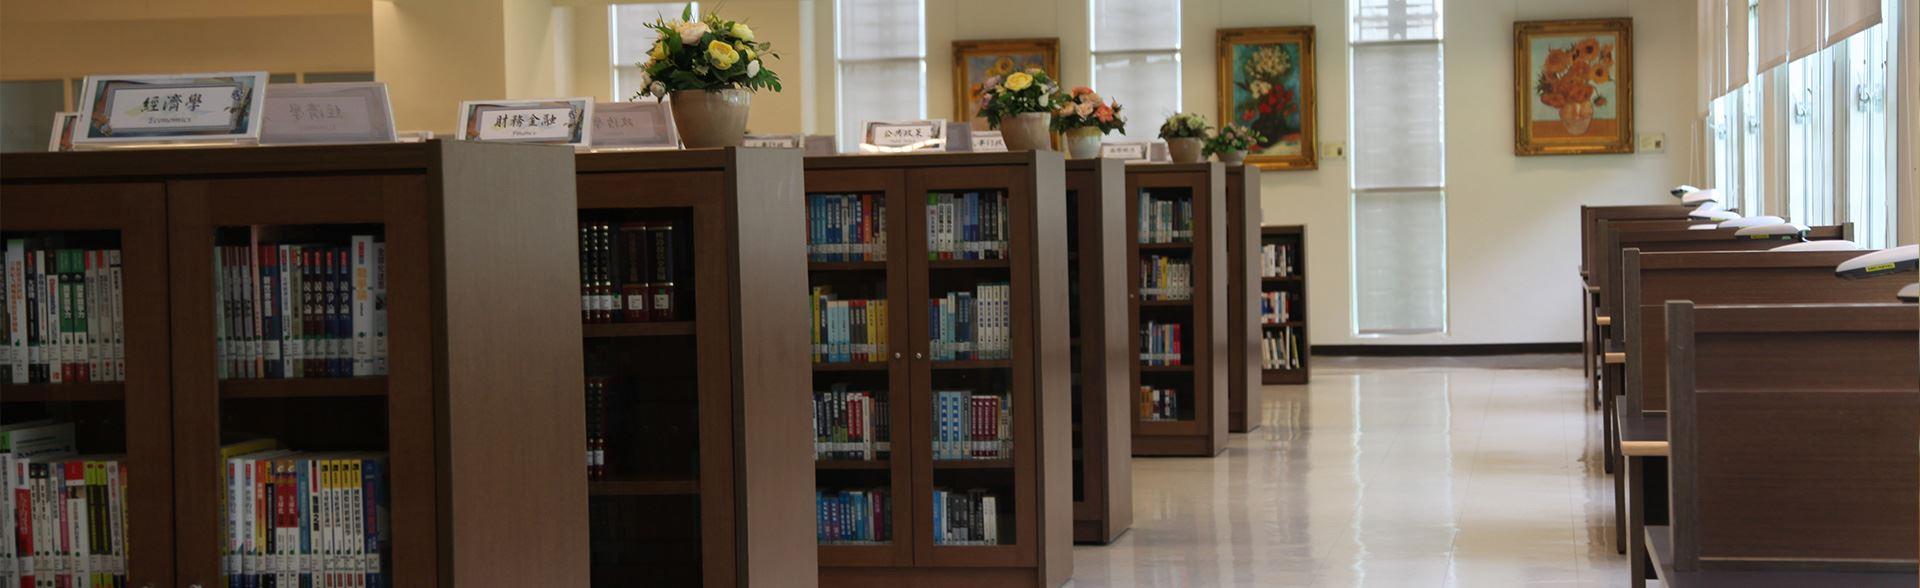 NACS library